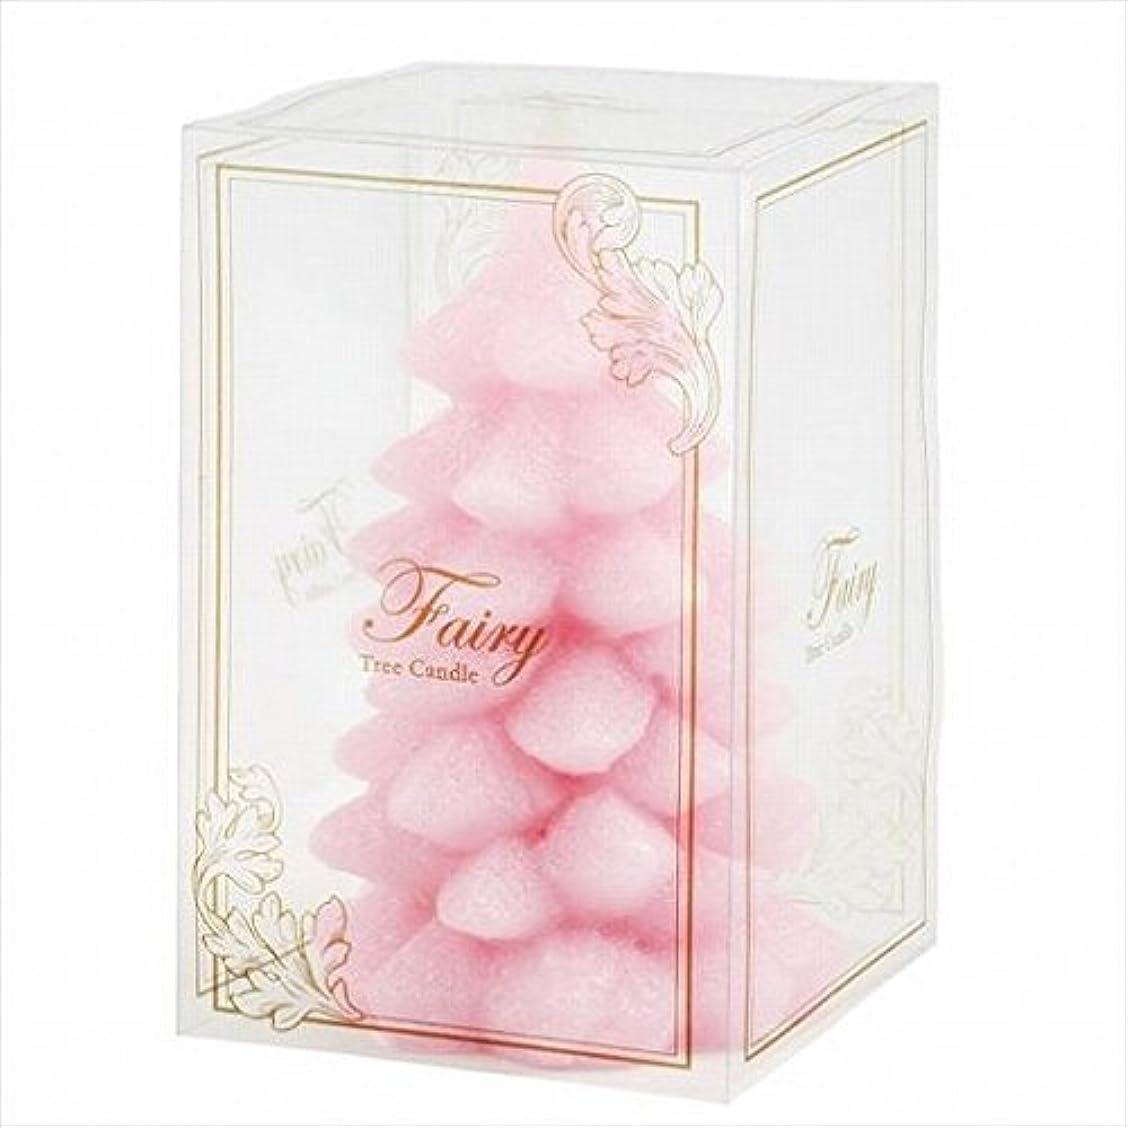 kameyama candle(カメヤマキャンドル) フェアリーツリーL 「 ピンク 」(A5890020PK)